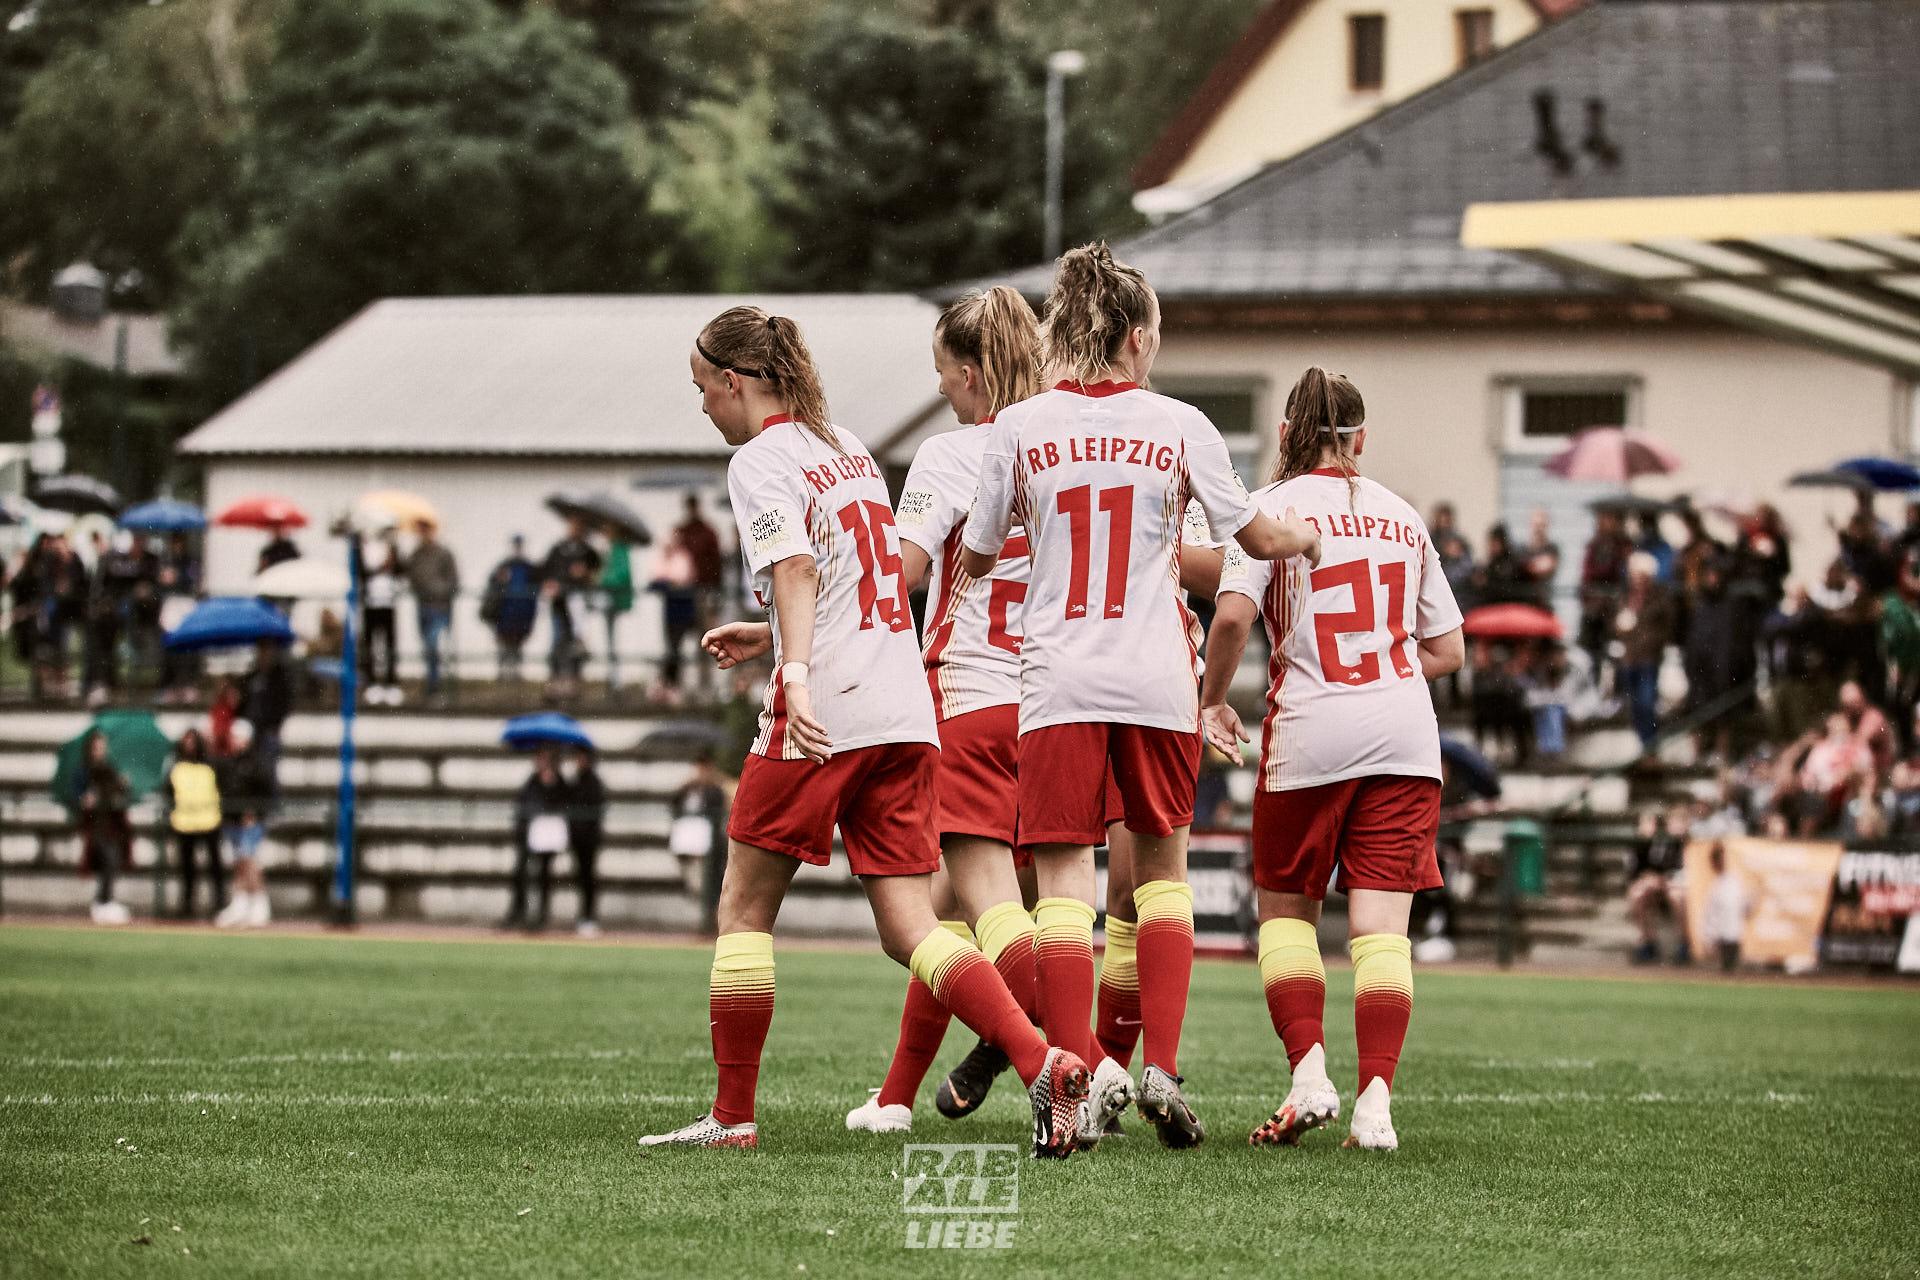 Sachsenpokalfinale: RB Leipzig -vs- FC Phoenix Leipzig